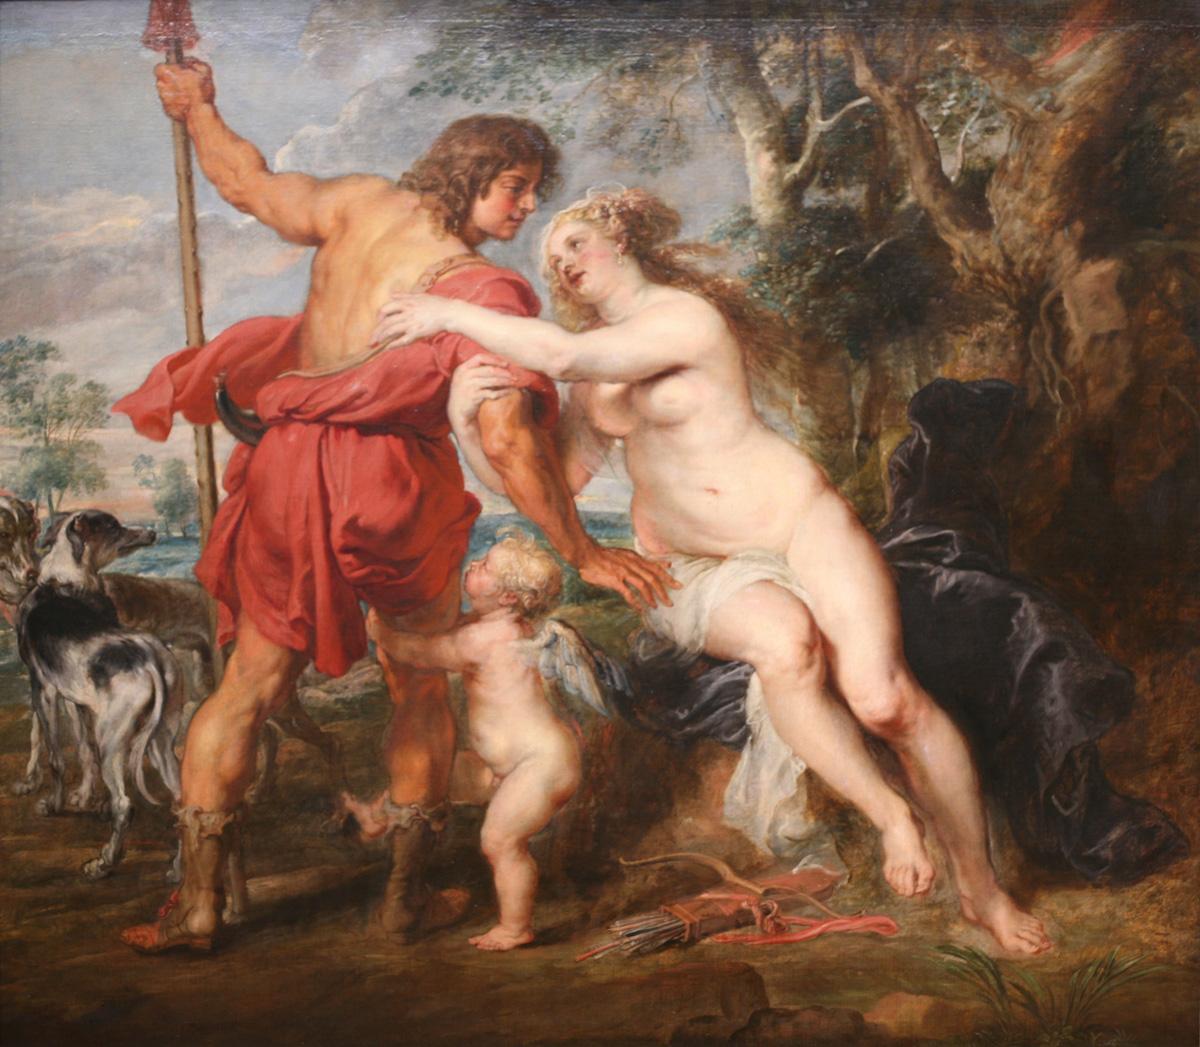 https://upload.wikimedia.org/wikipedia/commons/6/6c/WLA_metmuseum_Venus_and_Adonis_by_Peter_Paul_Rubens.jpg